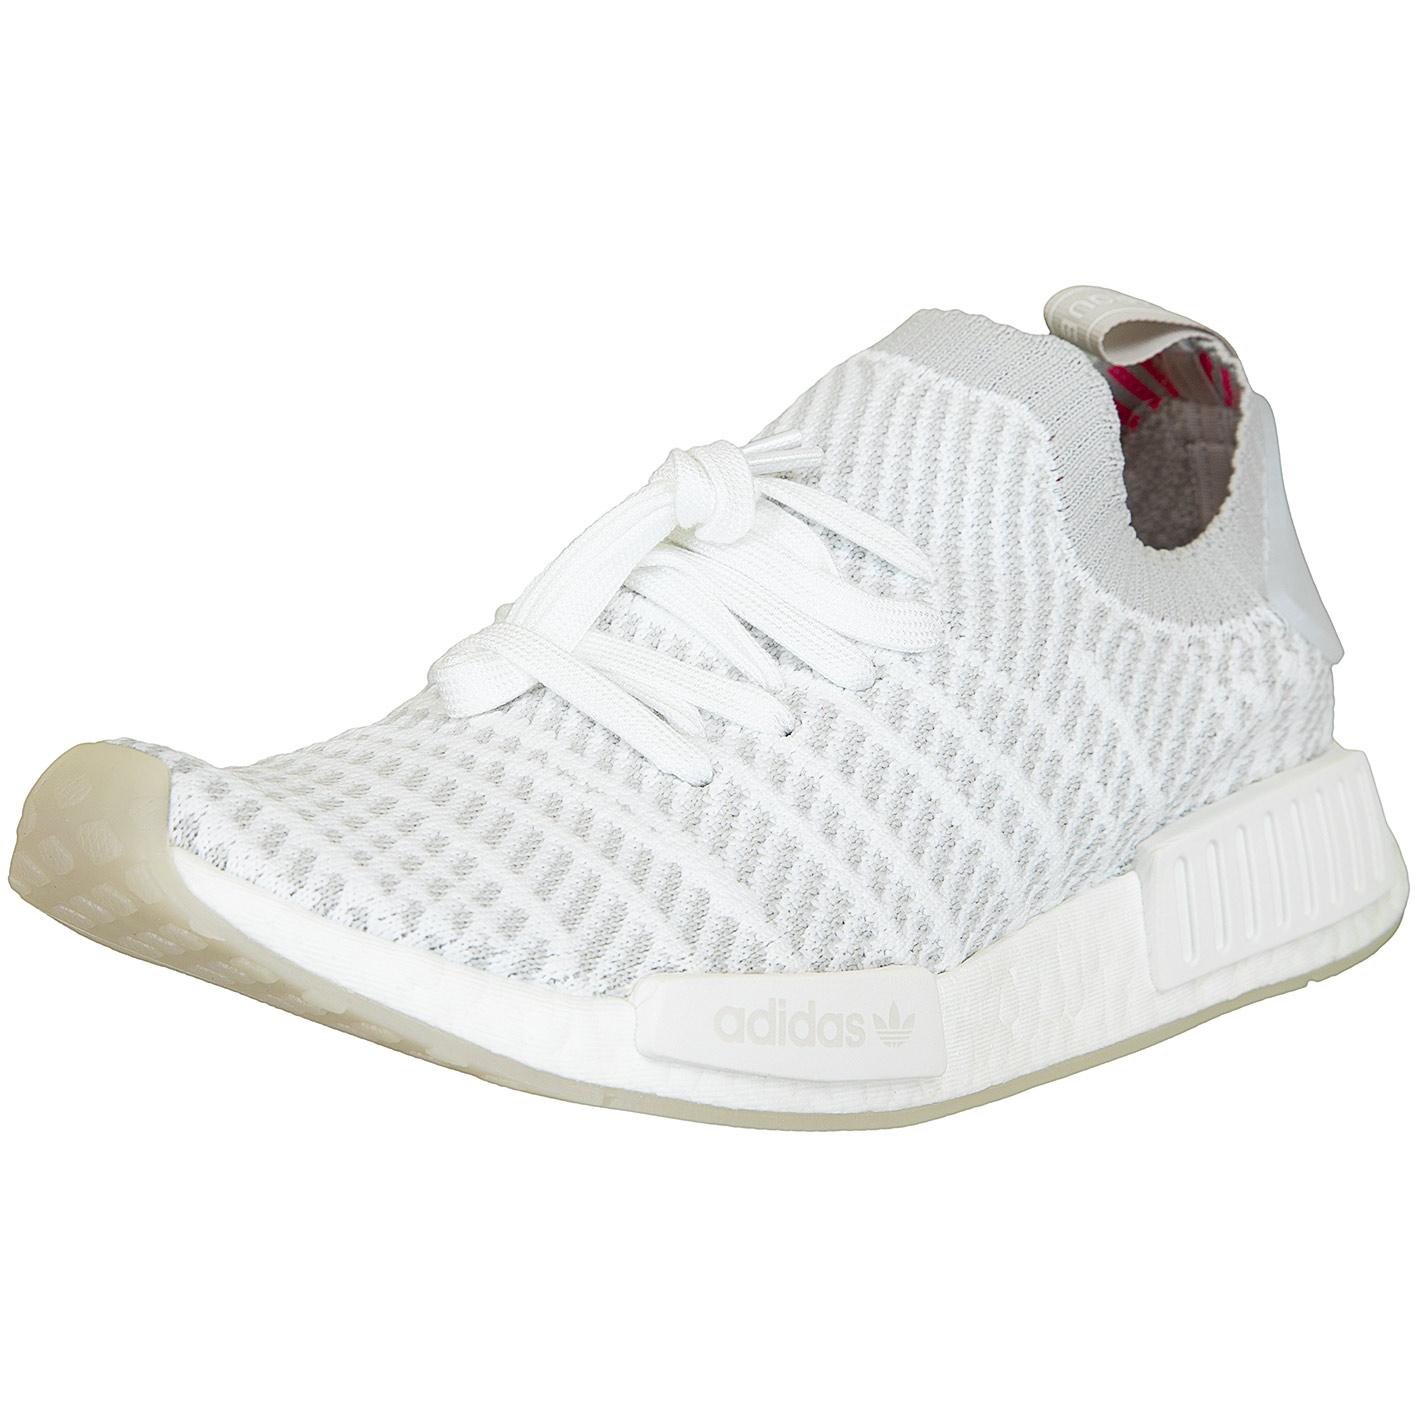 Herren Adidas Sneakers Adidas Originals NMD R1 Primeknit